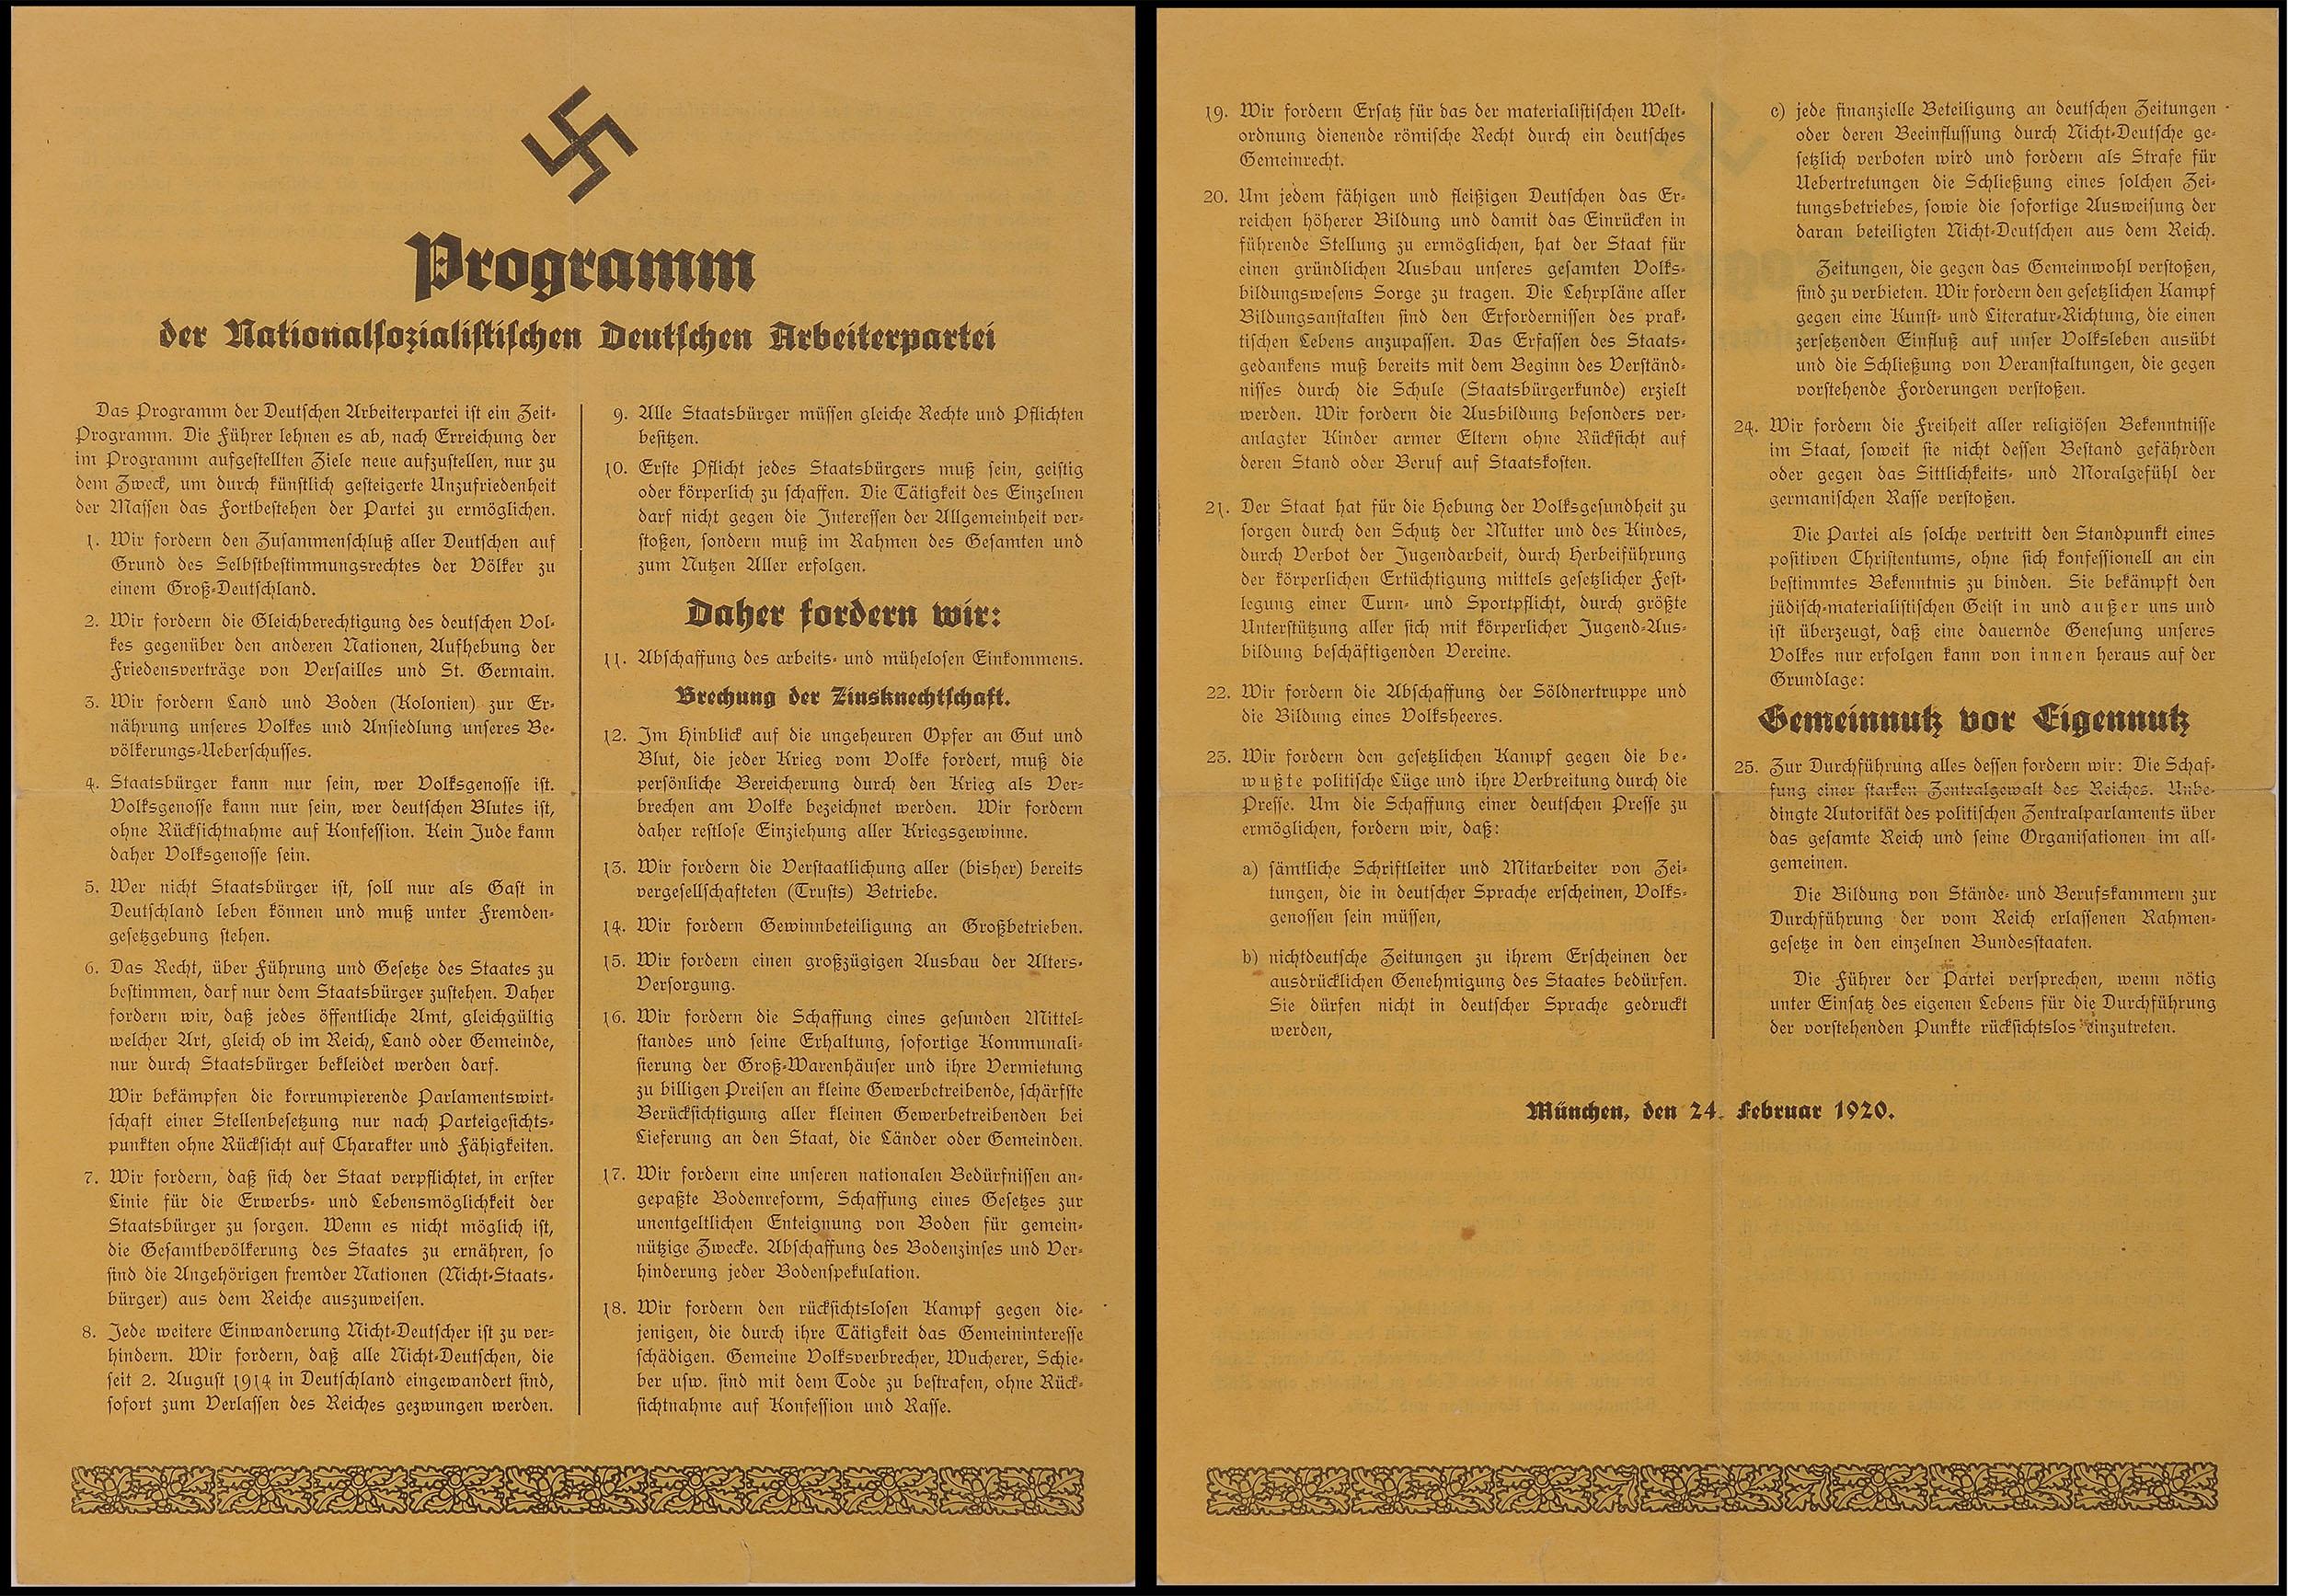 First political program of the National Socialist German Workers' Party (nsdap), Anton Drexler (1884-1942) and Adolf Hitler (1889-1945), Munich, Feb. 24, 1920